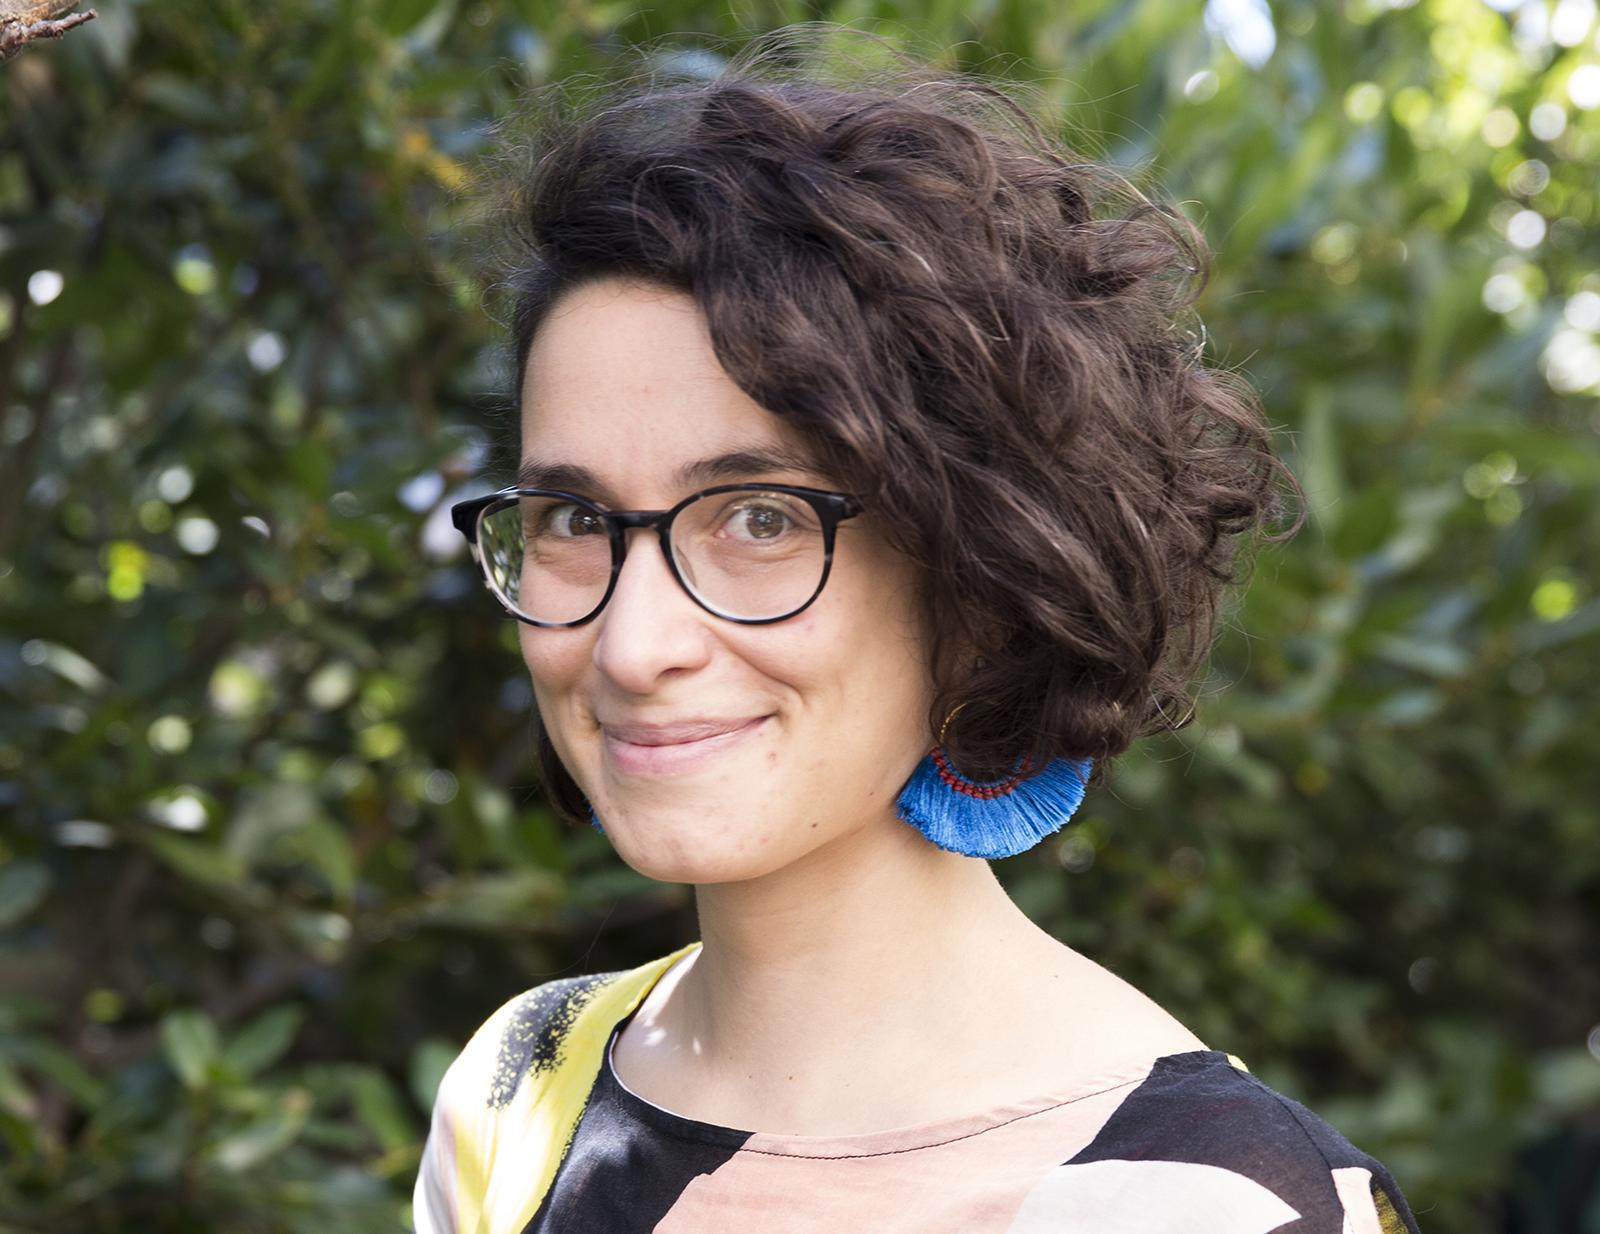 Amandine Thomas, illustrator and design